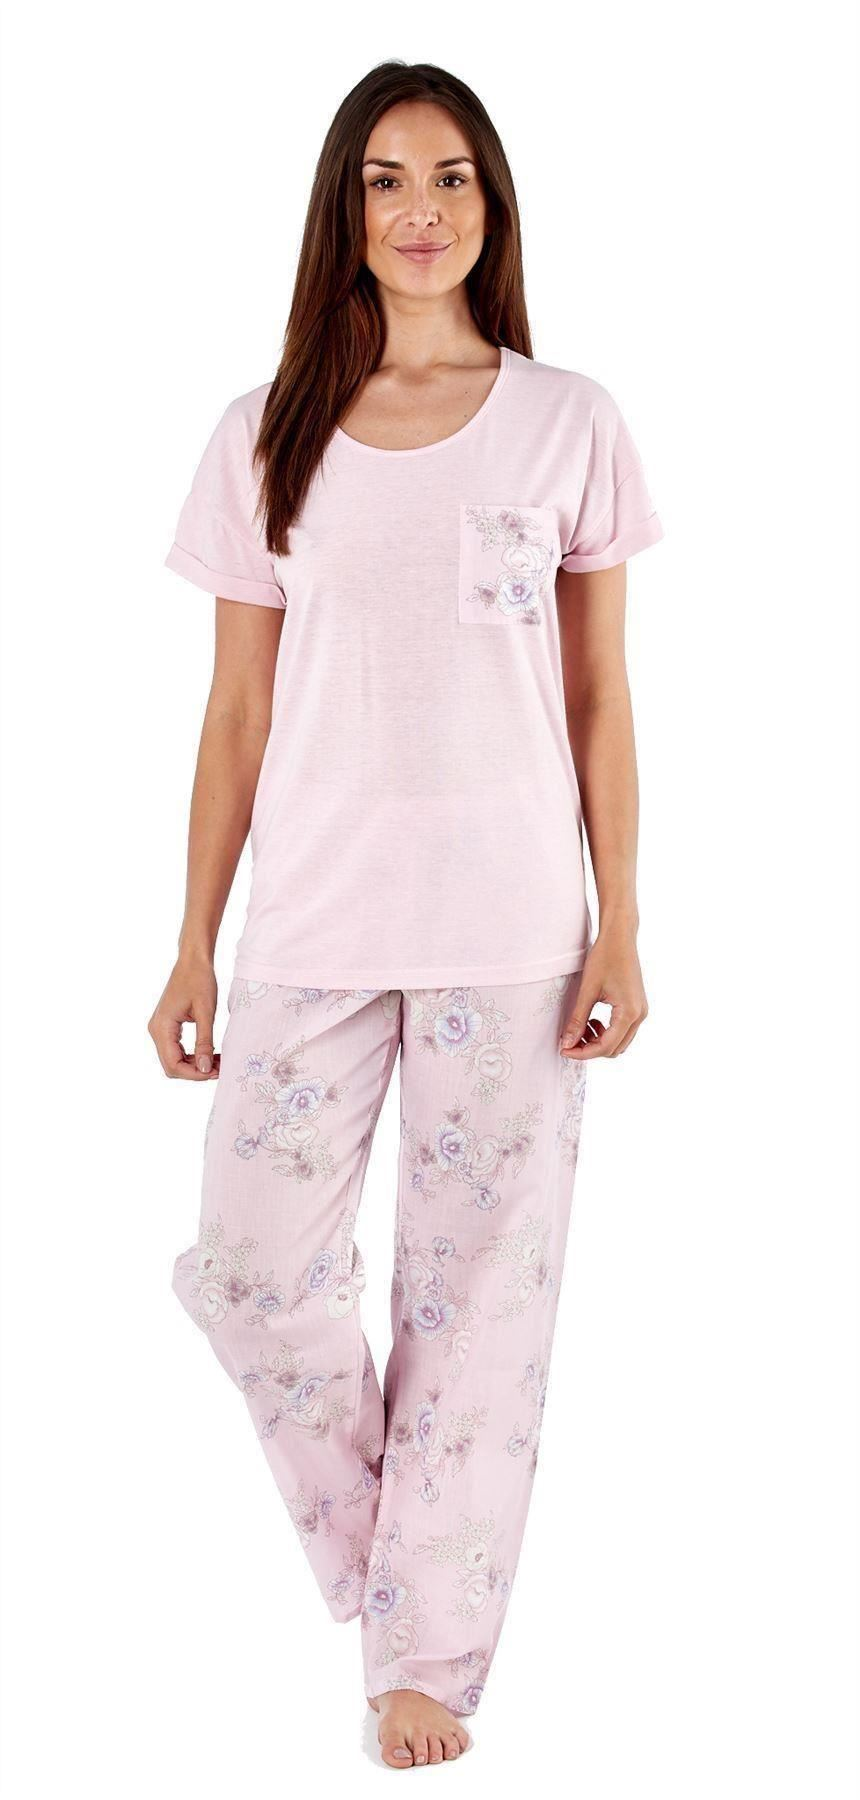 Mesdames-Eliza-Pyjamas-Imprime-Floral-Pantalon-en-Coton-Jersey-Top-Tisse-Lounge-Sleepwear